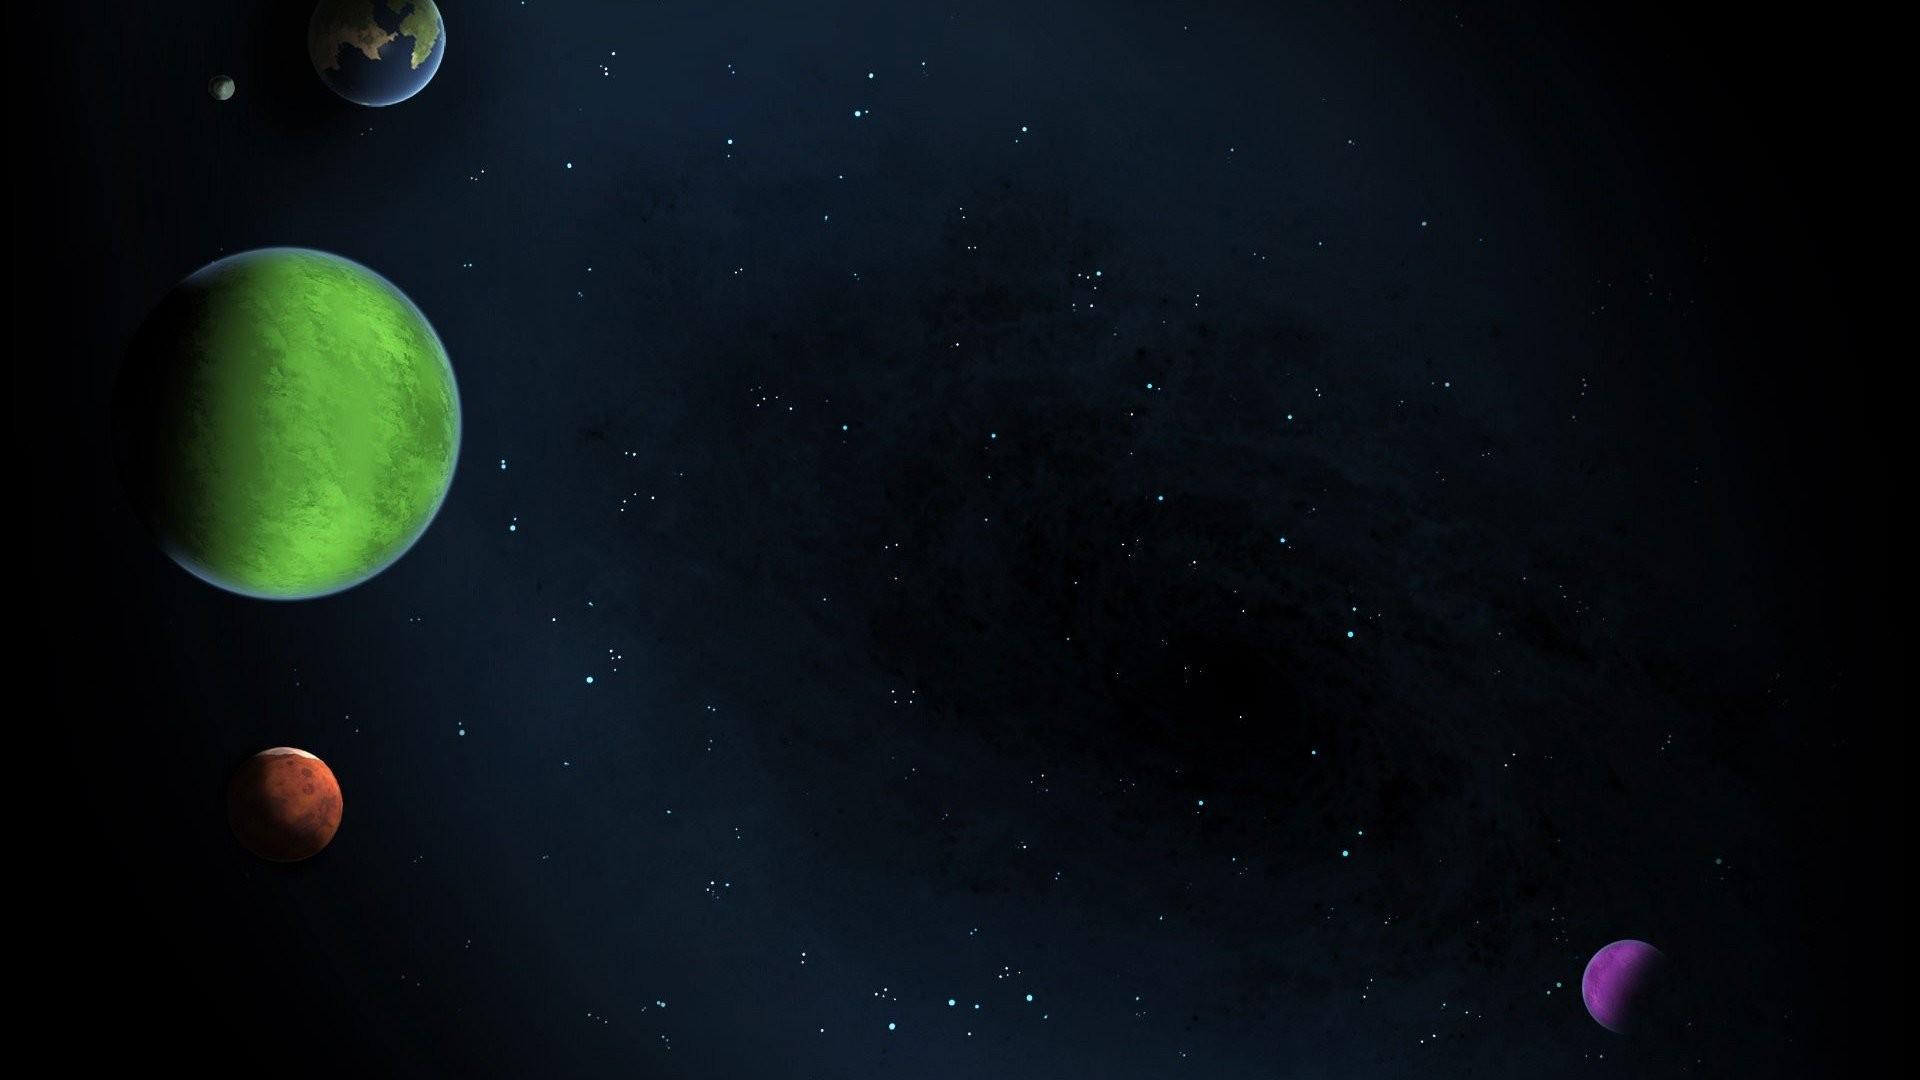 KERBAL SPACE PROGRAM sci-fi cartoon family ksp space flight simulator alien  wallpaper     411148   WallpaperUP